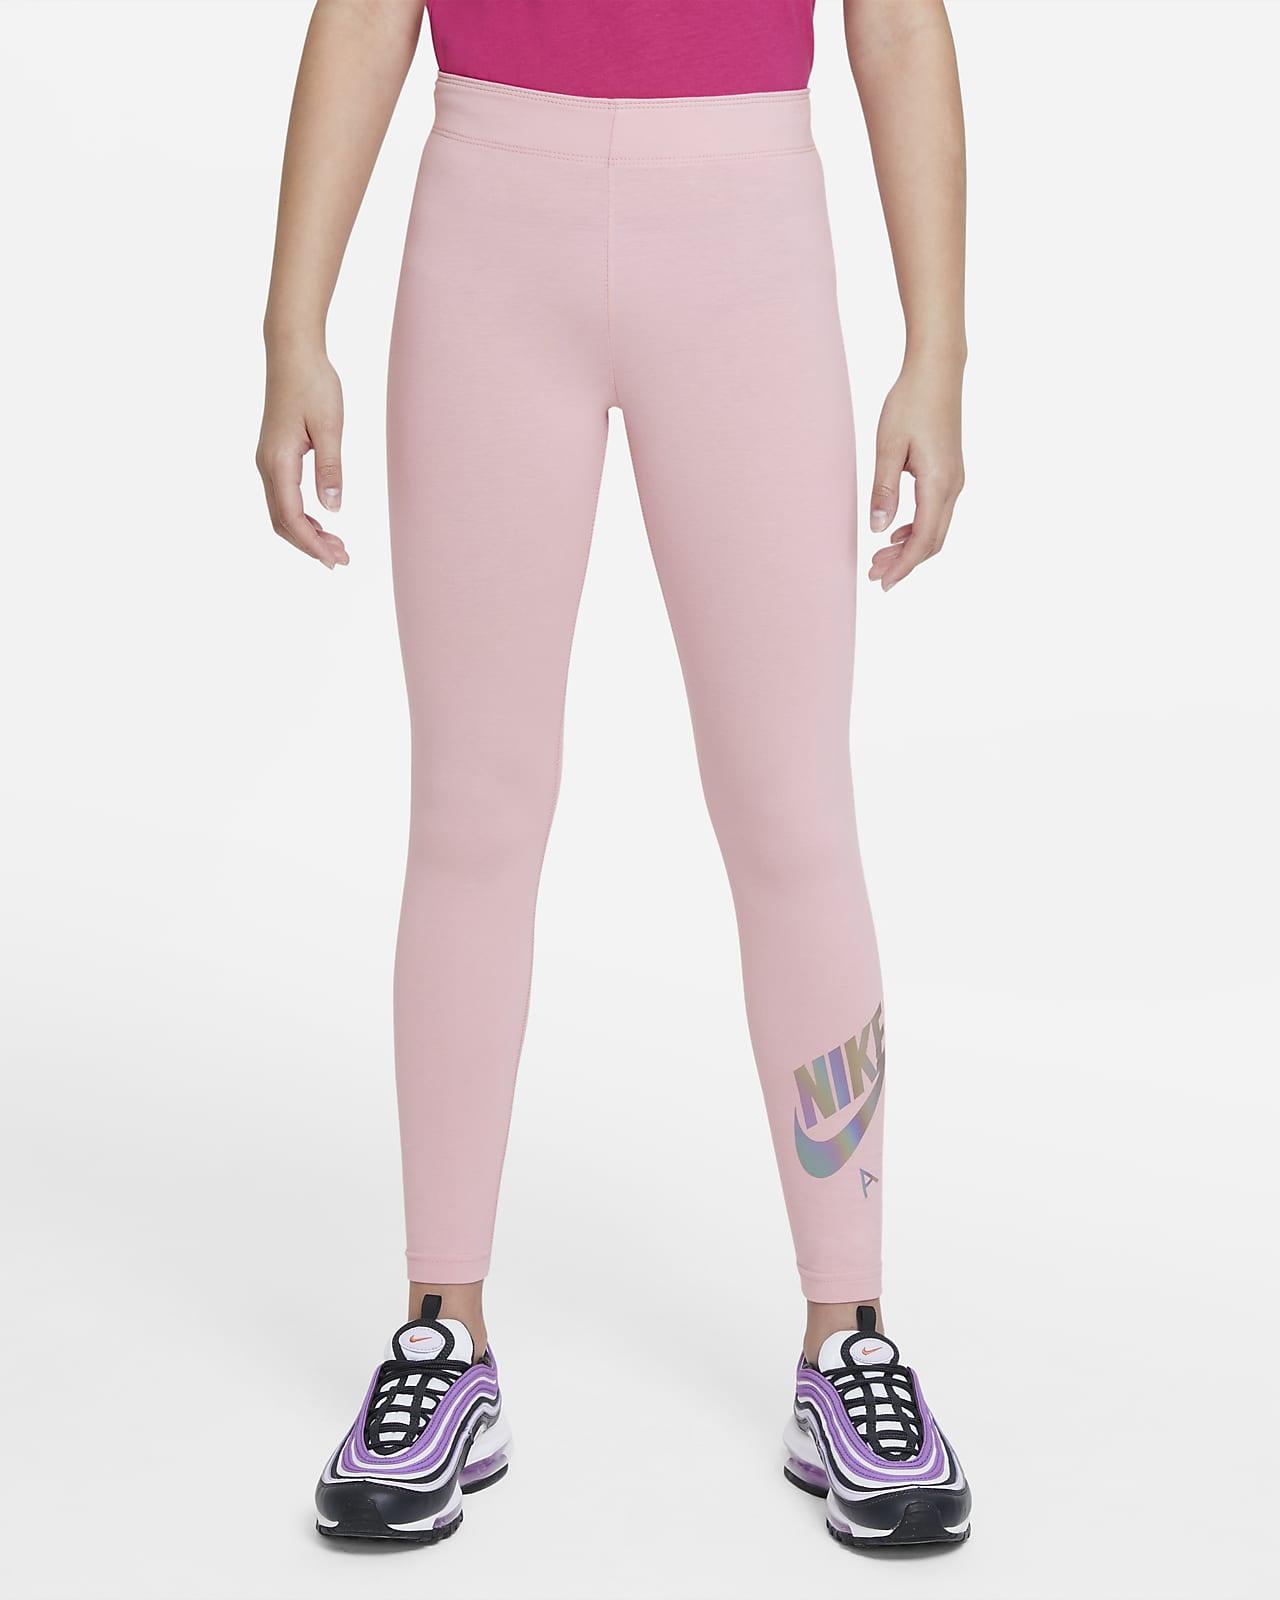 Nike Air Older Kids' (Girls') Leggings